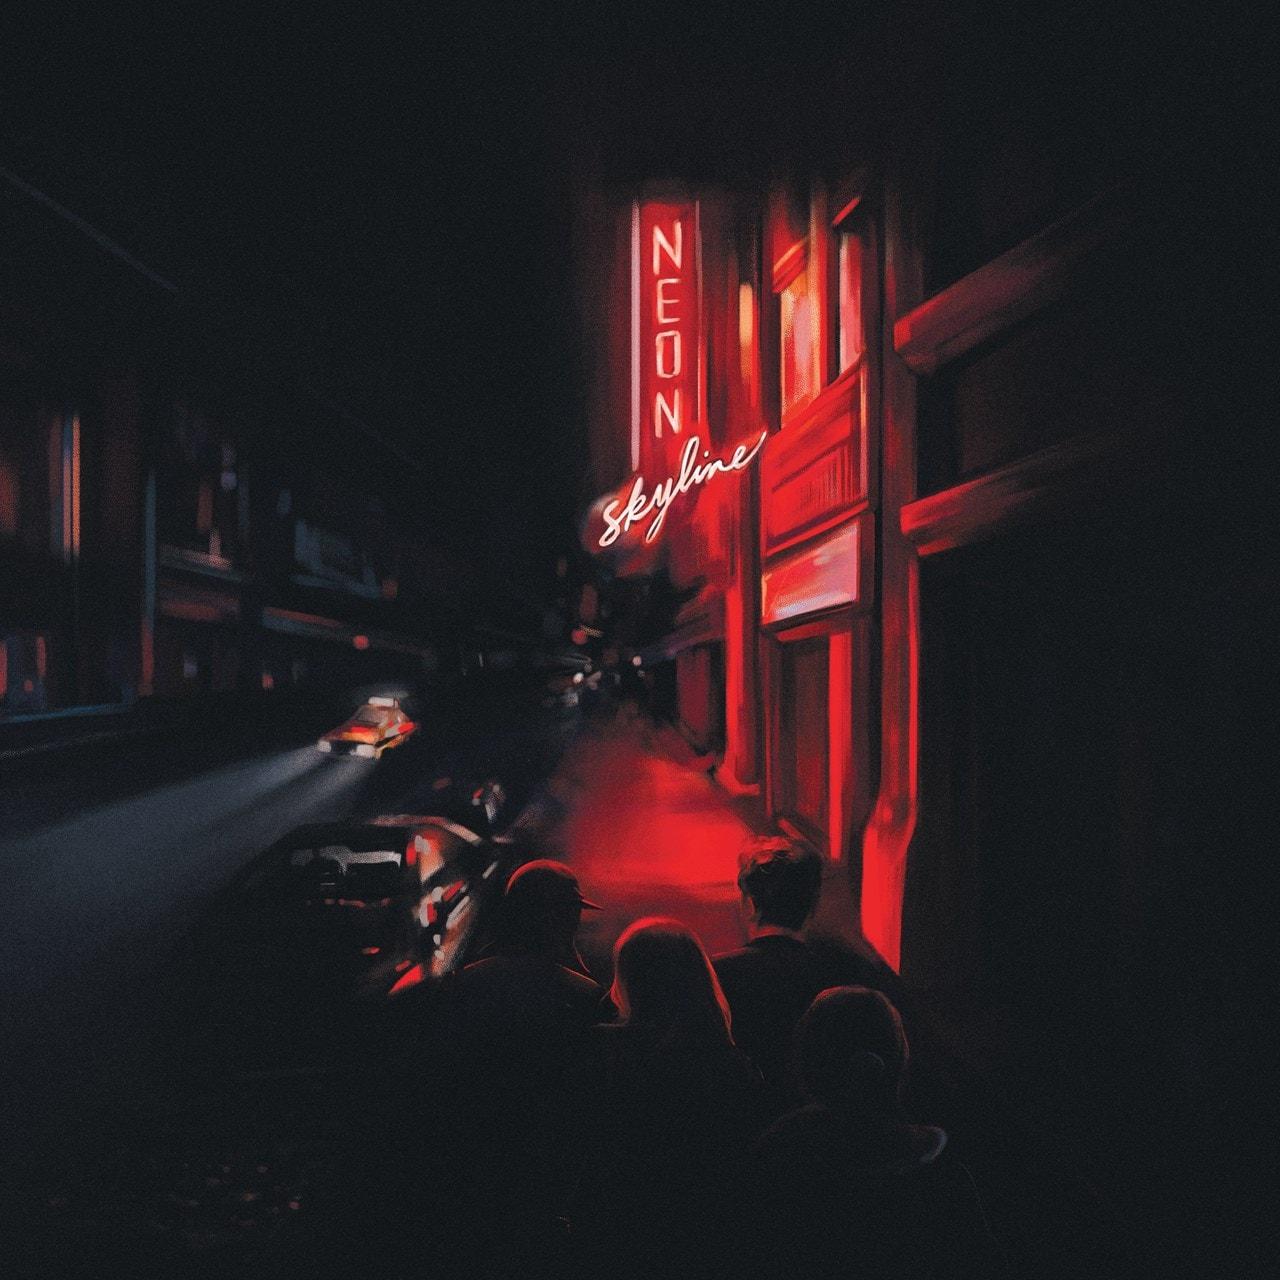 The Neon Skyline - 1